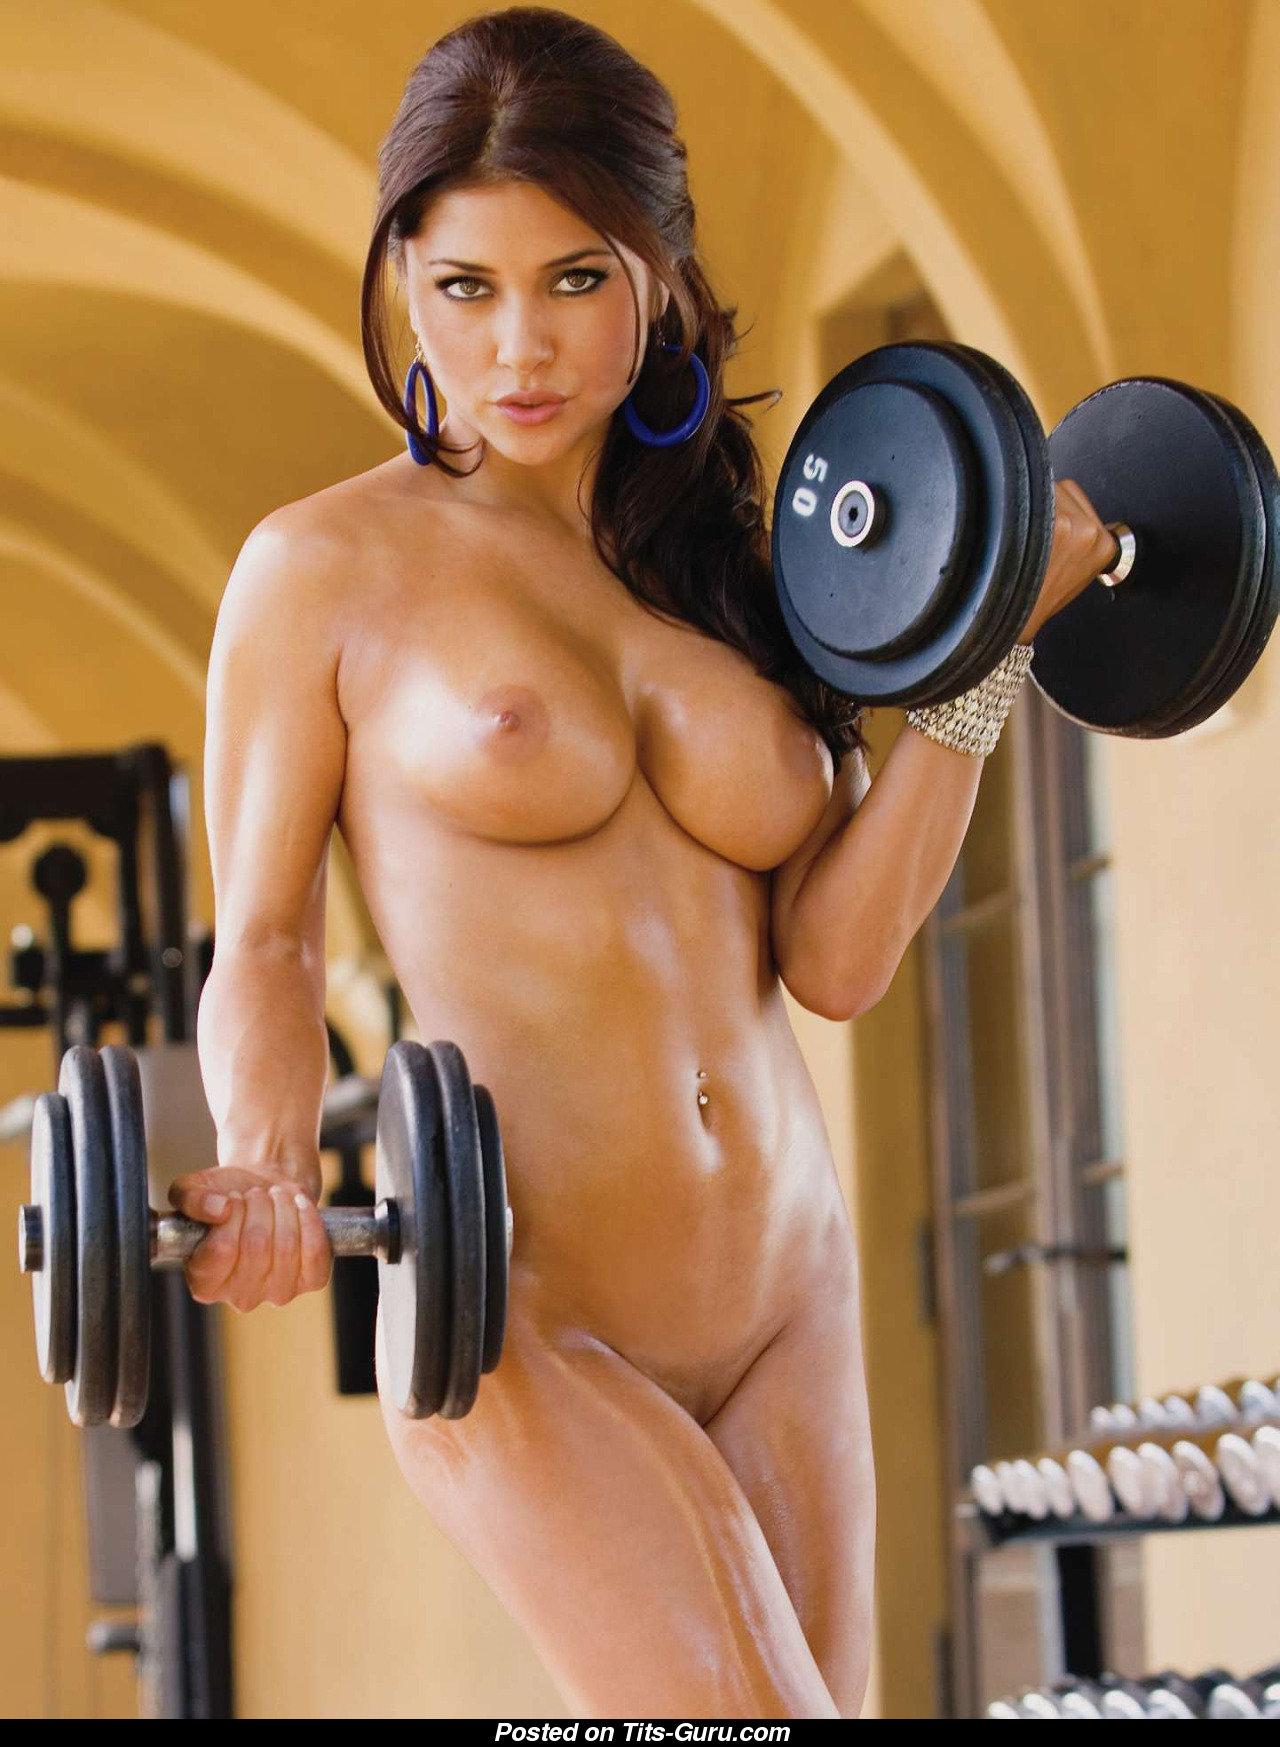 smotret-eroticheskoe-sportivnoe-foto